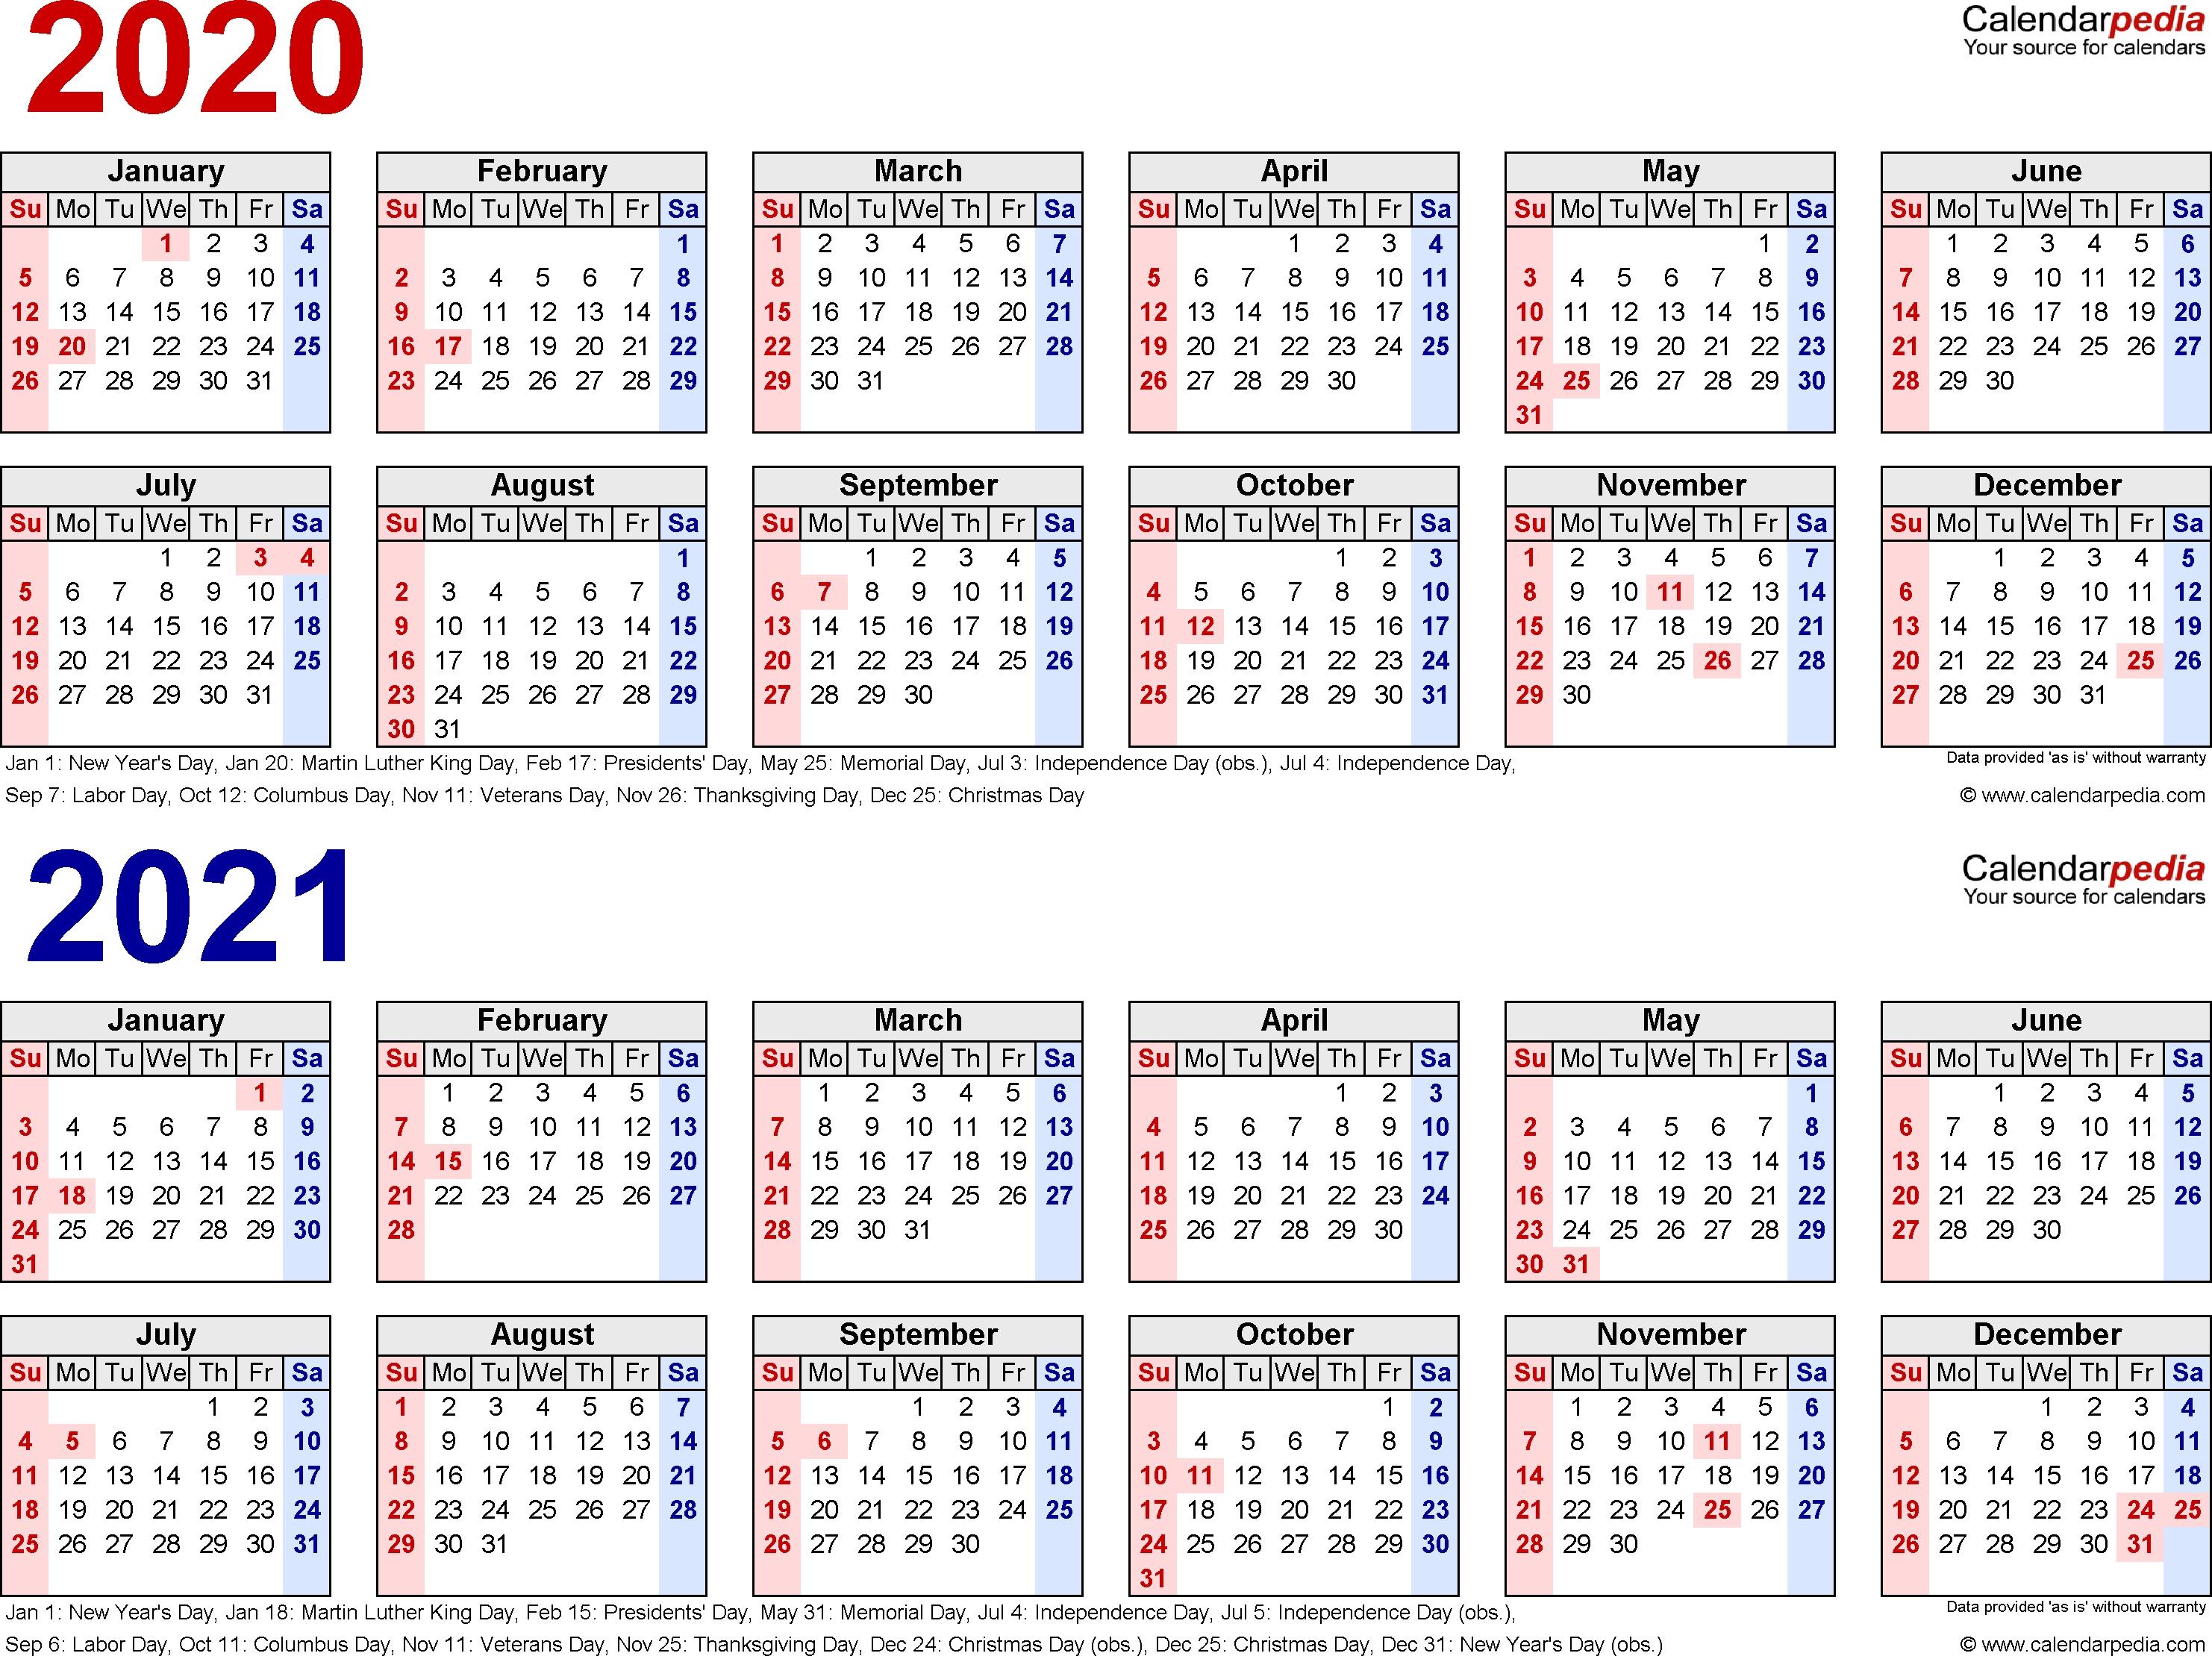 2020-2021 Calendar - Free Printable Two-Year Word Calendars-Calendar Template Calendarlabs 2020